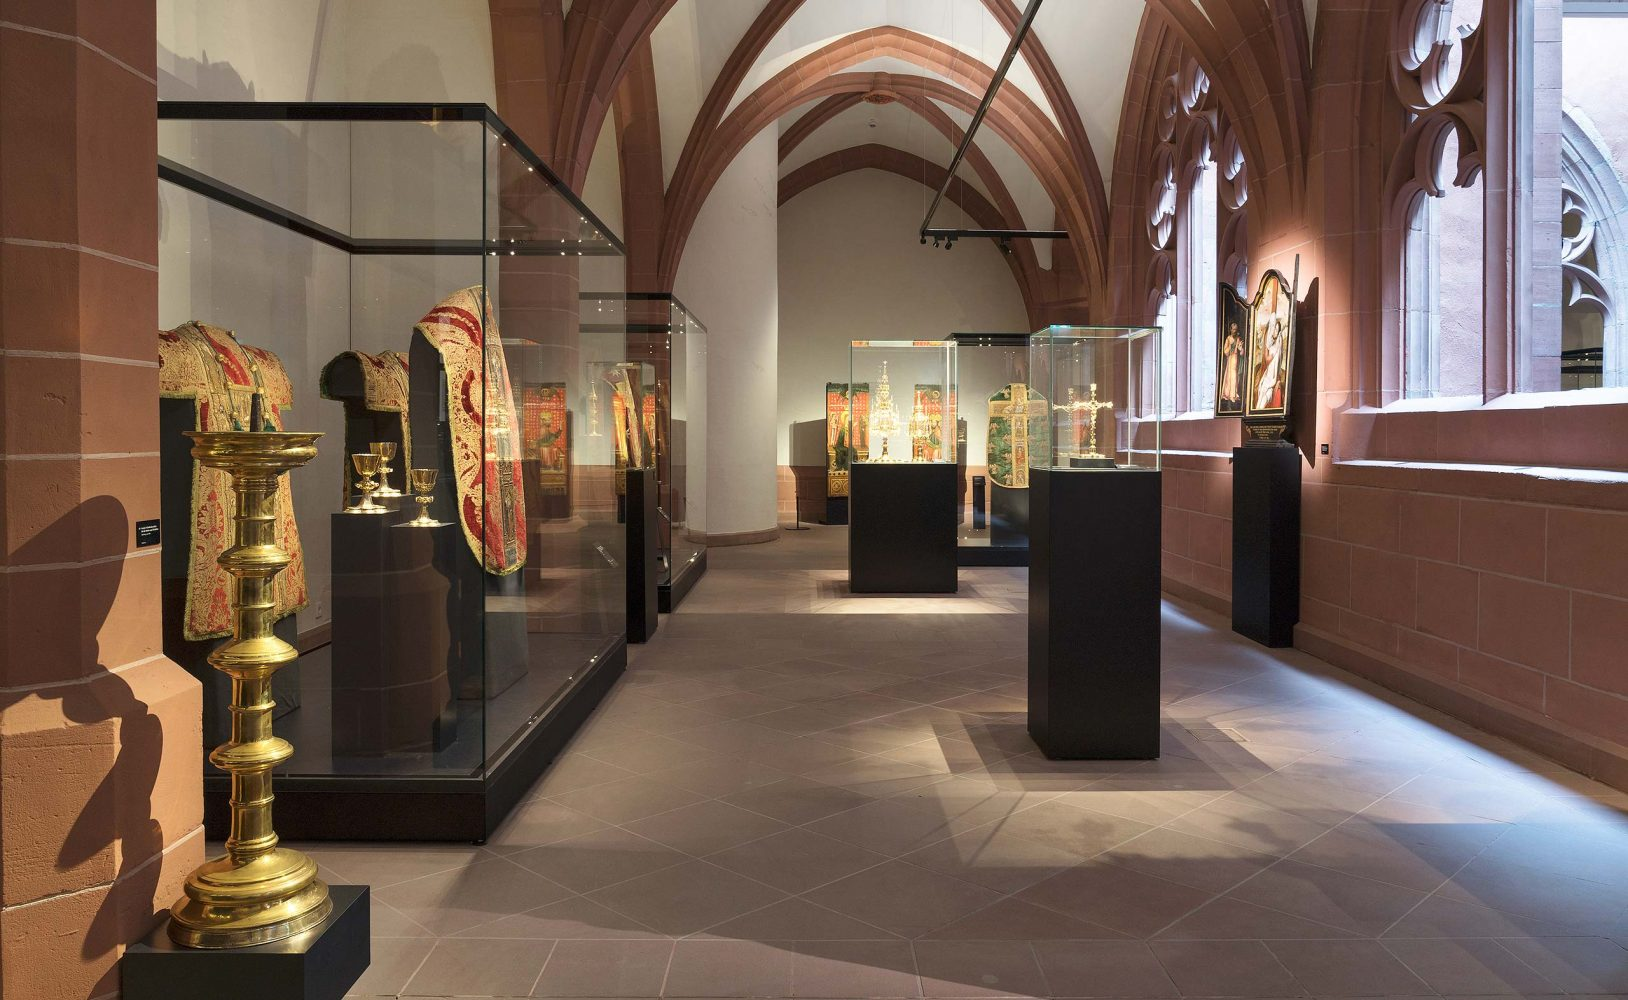 St. Georg Dommuseum, Frankfurt